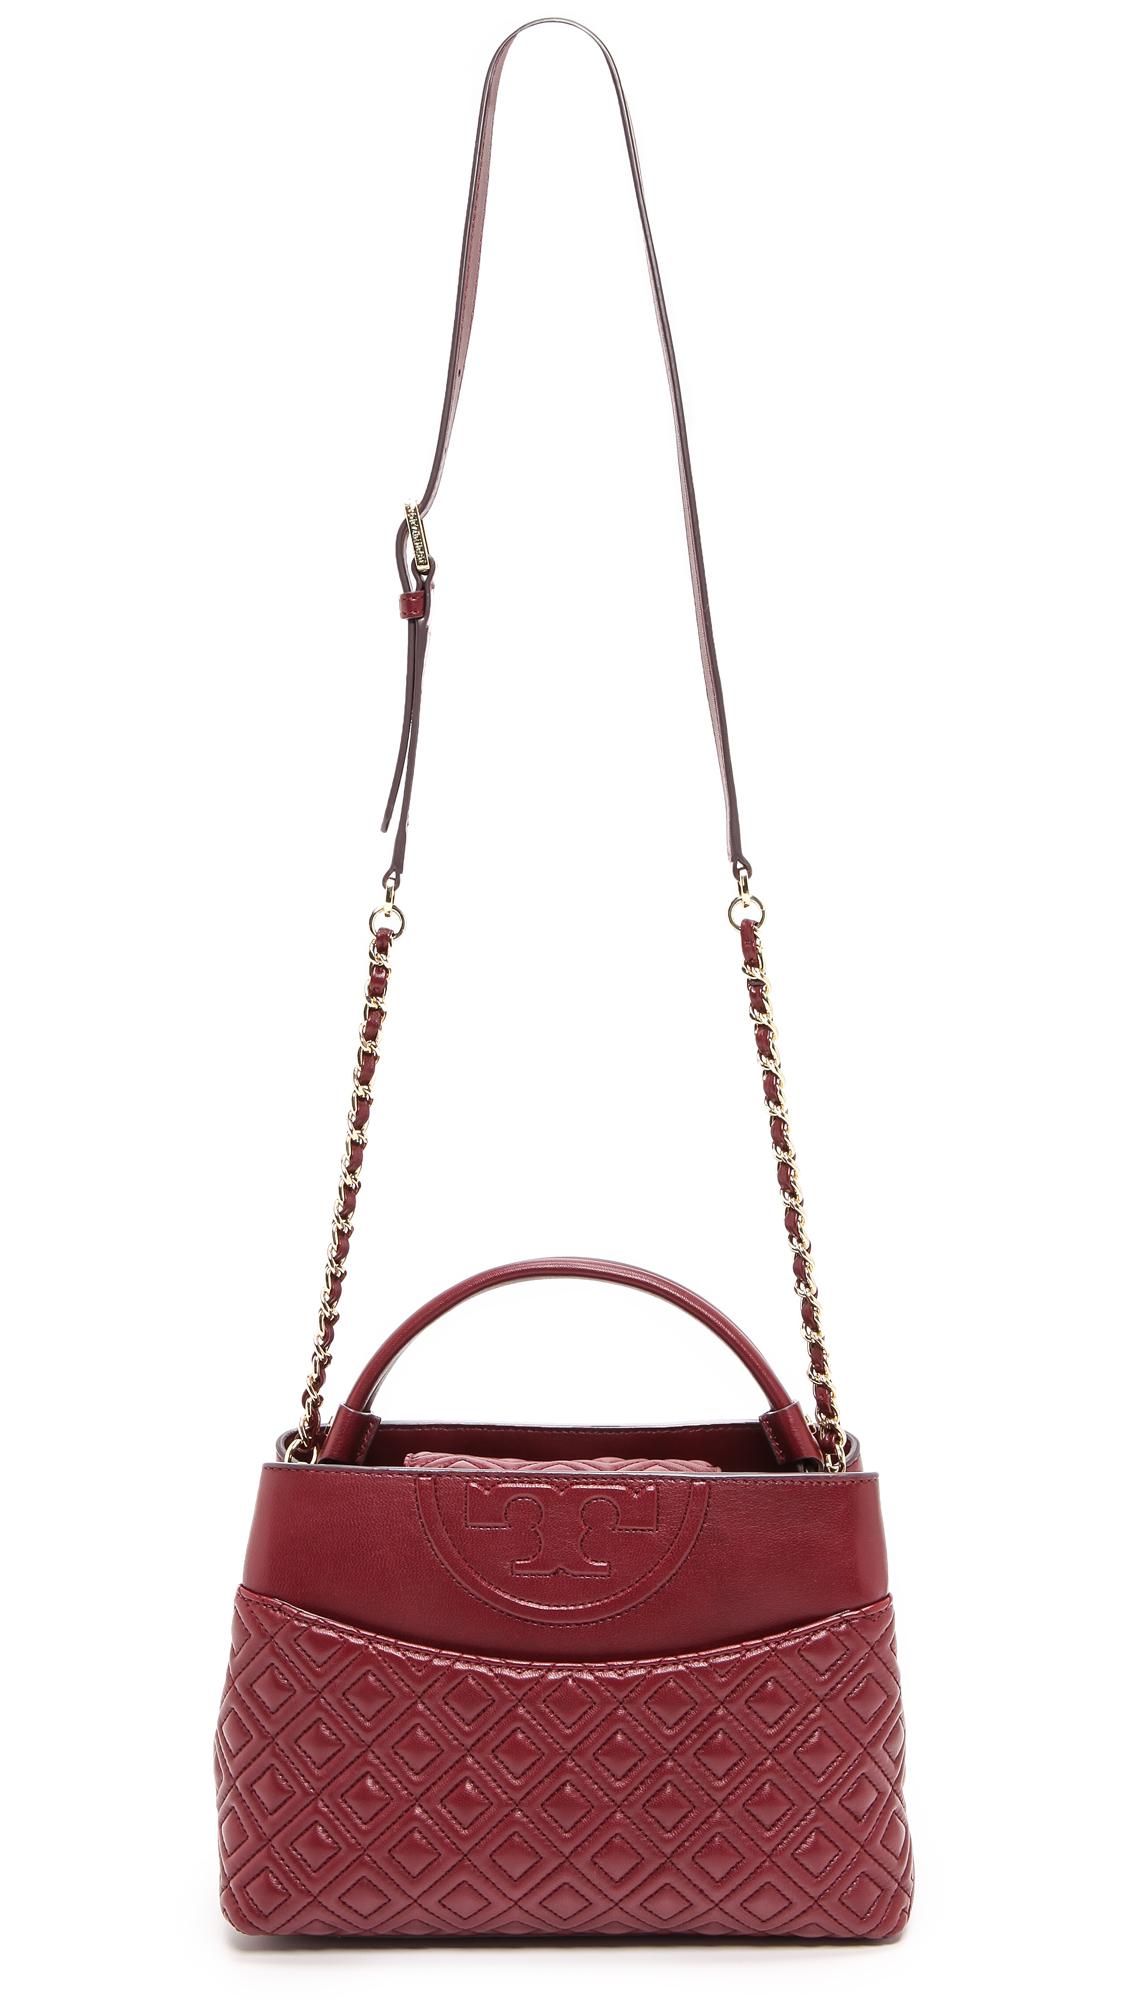 ea455e72631b coupon for tory burch handbag small fleming b11c6 908d9